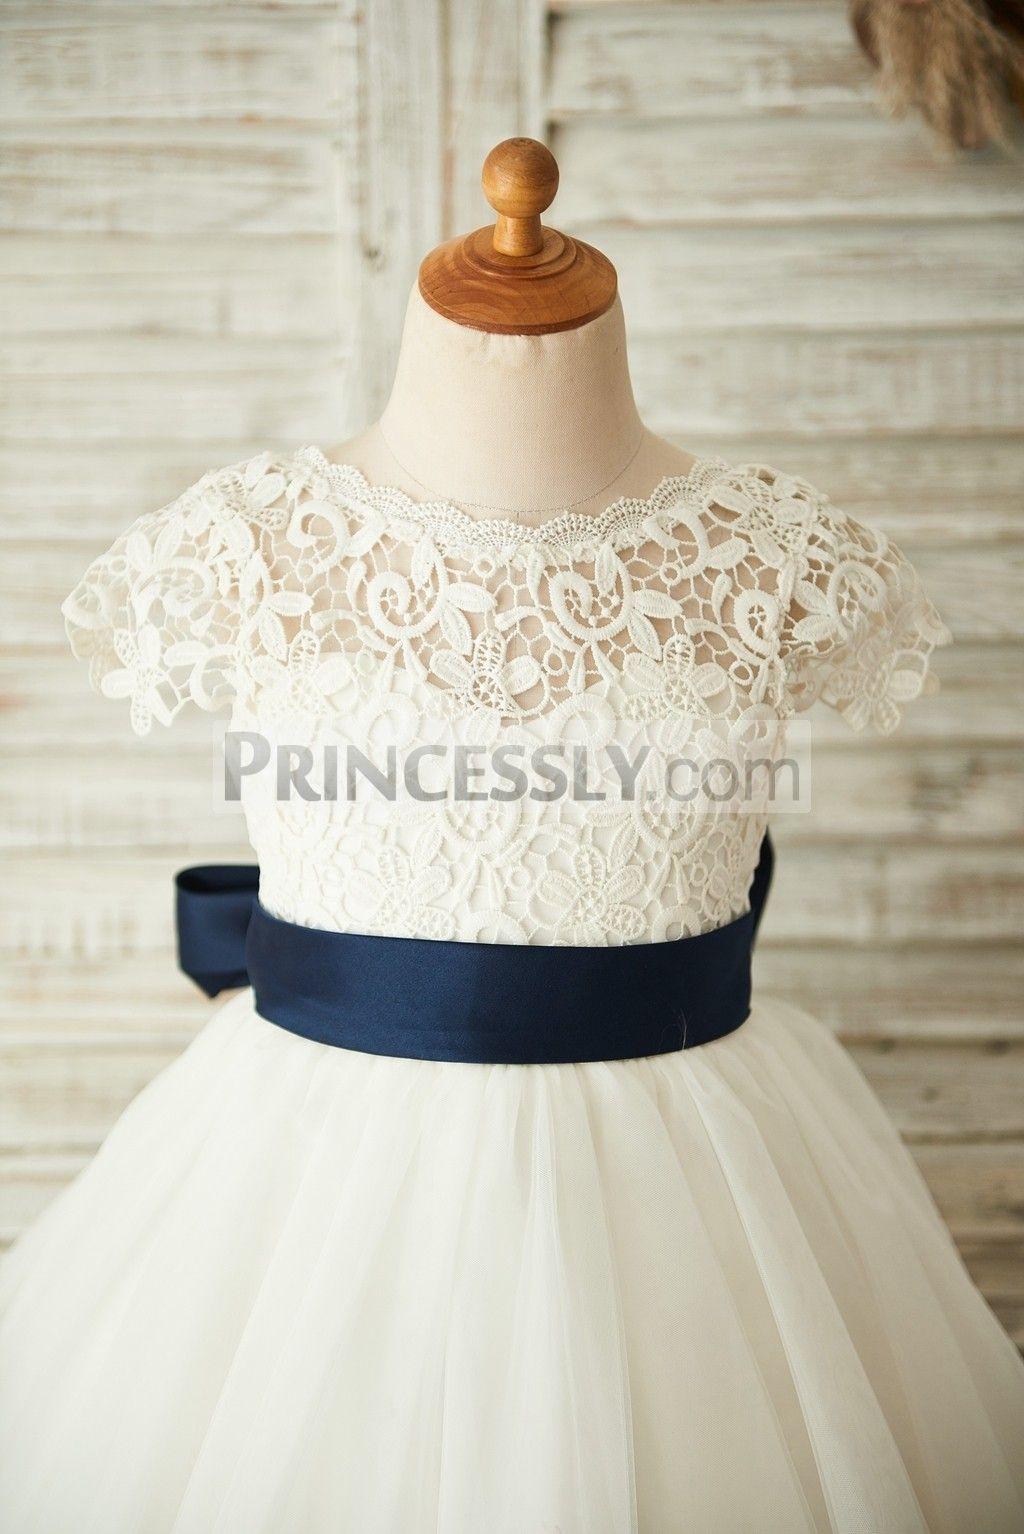 Short sleeves v back lace tulle wedding flower girl dress with navy